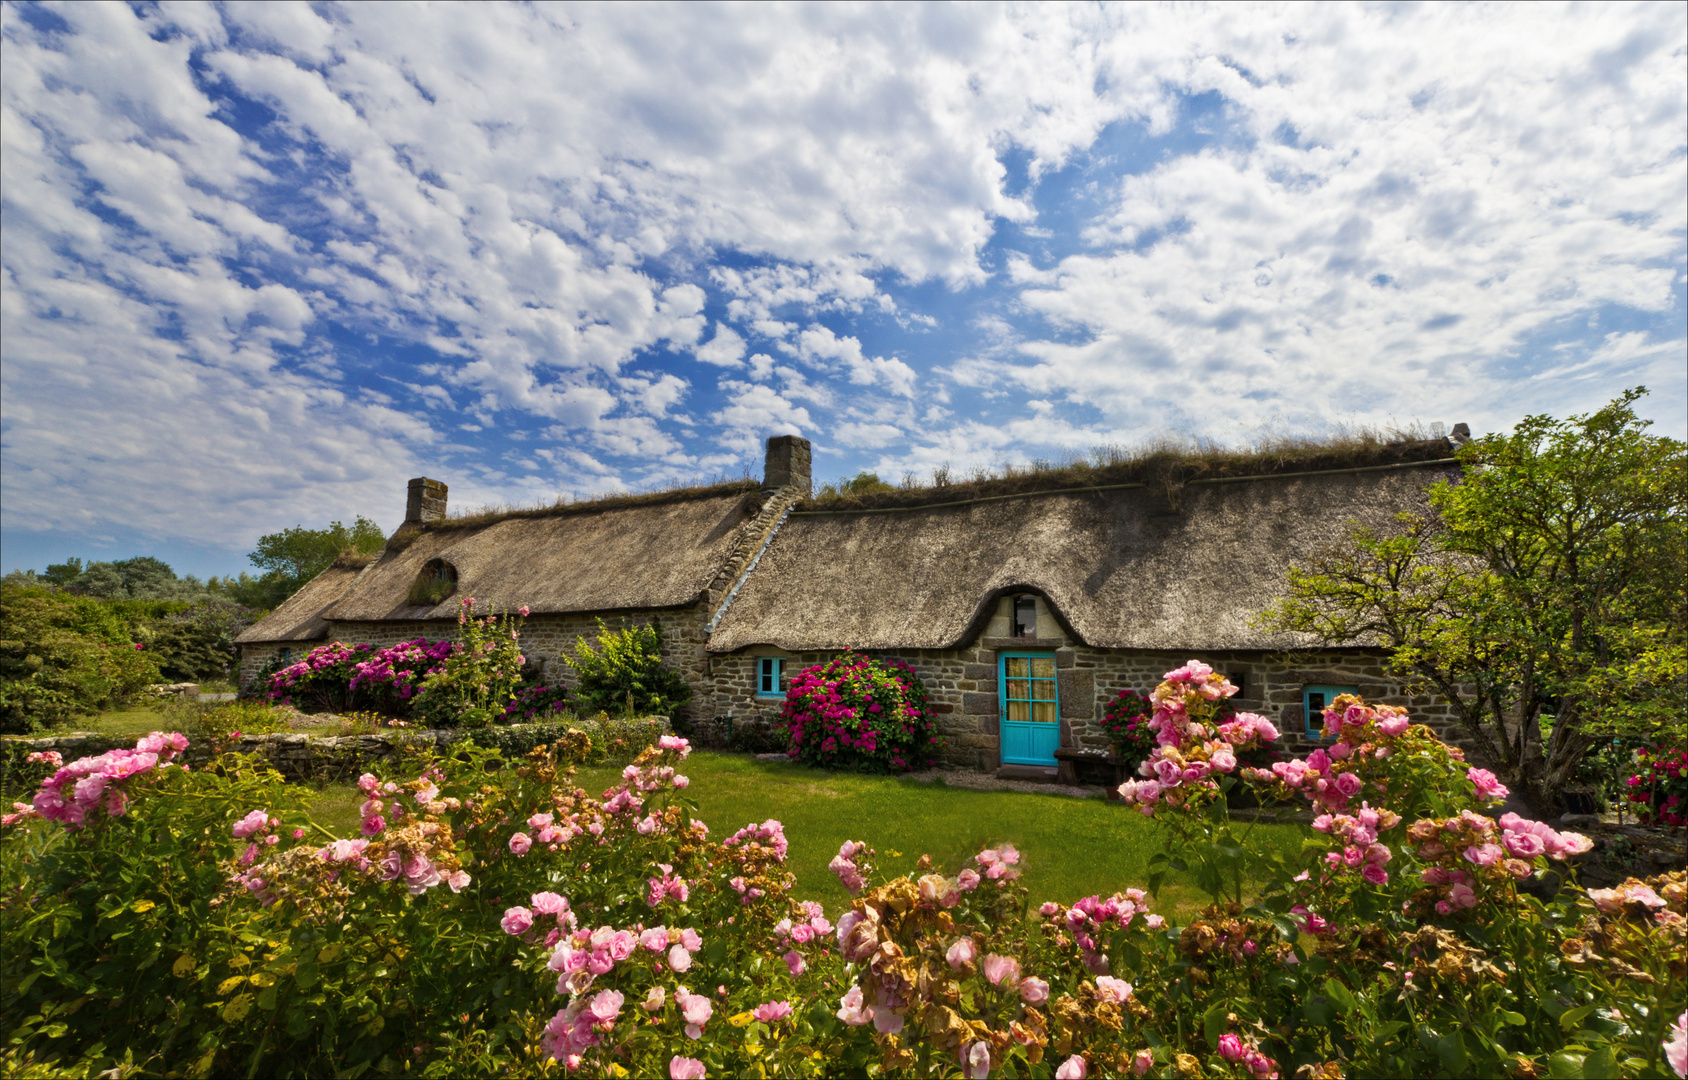 Maisons bretonnes photo et image world finist re france images fotocomm - Maisons bretonnes typiques ...